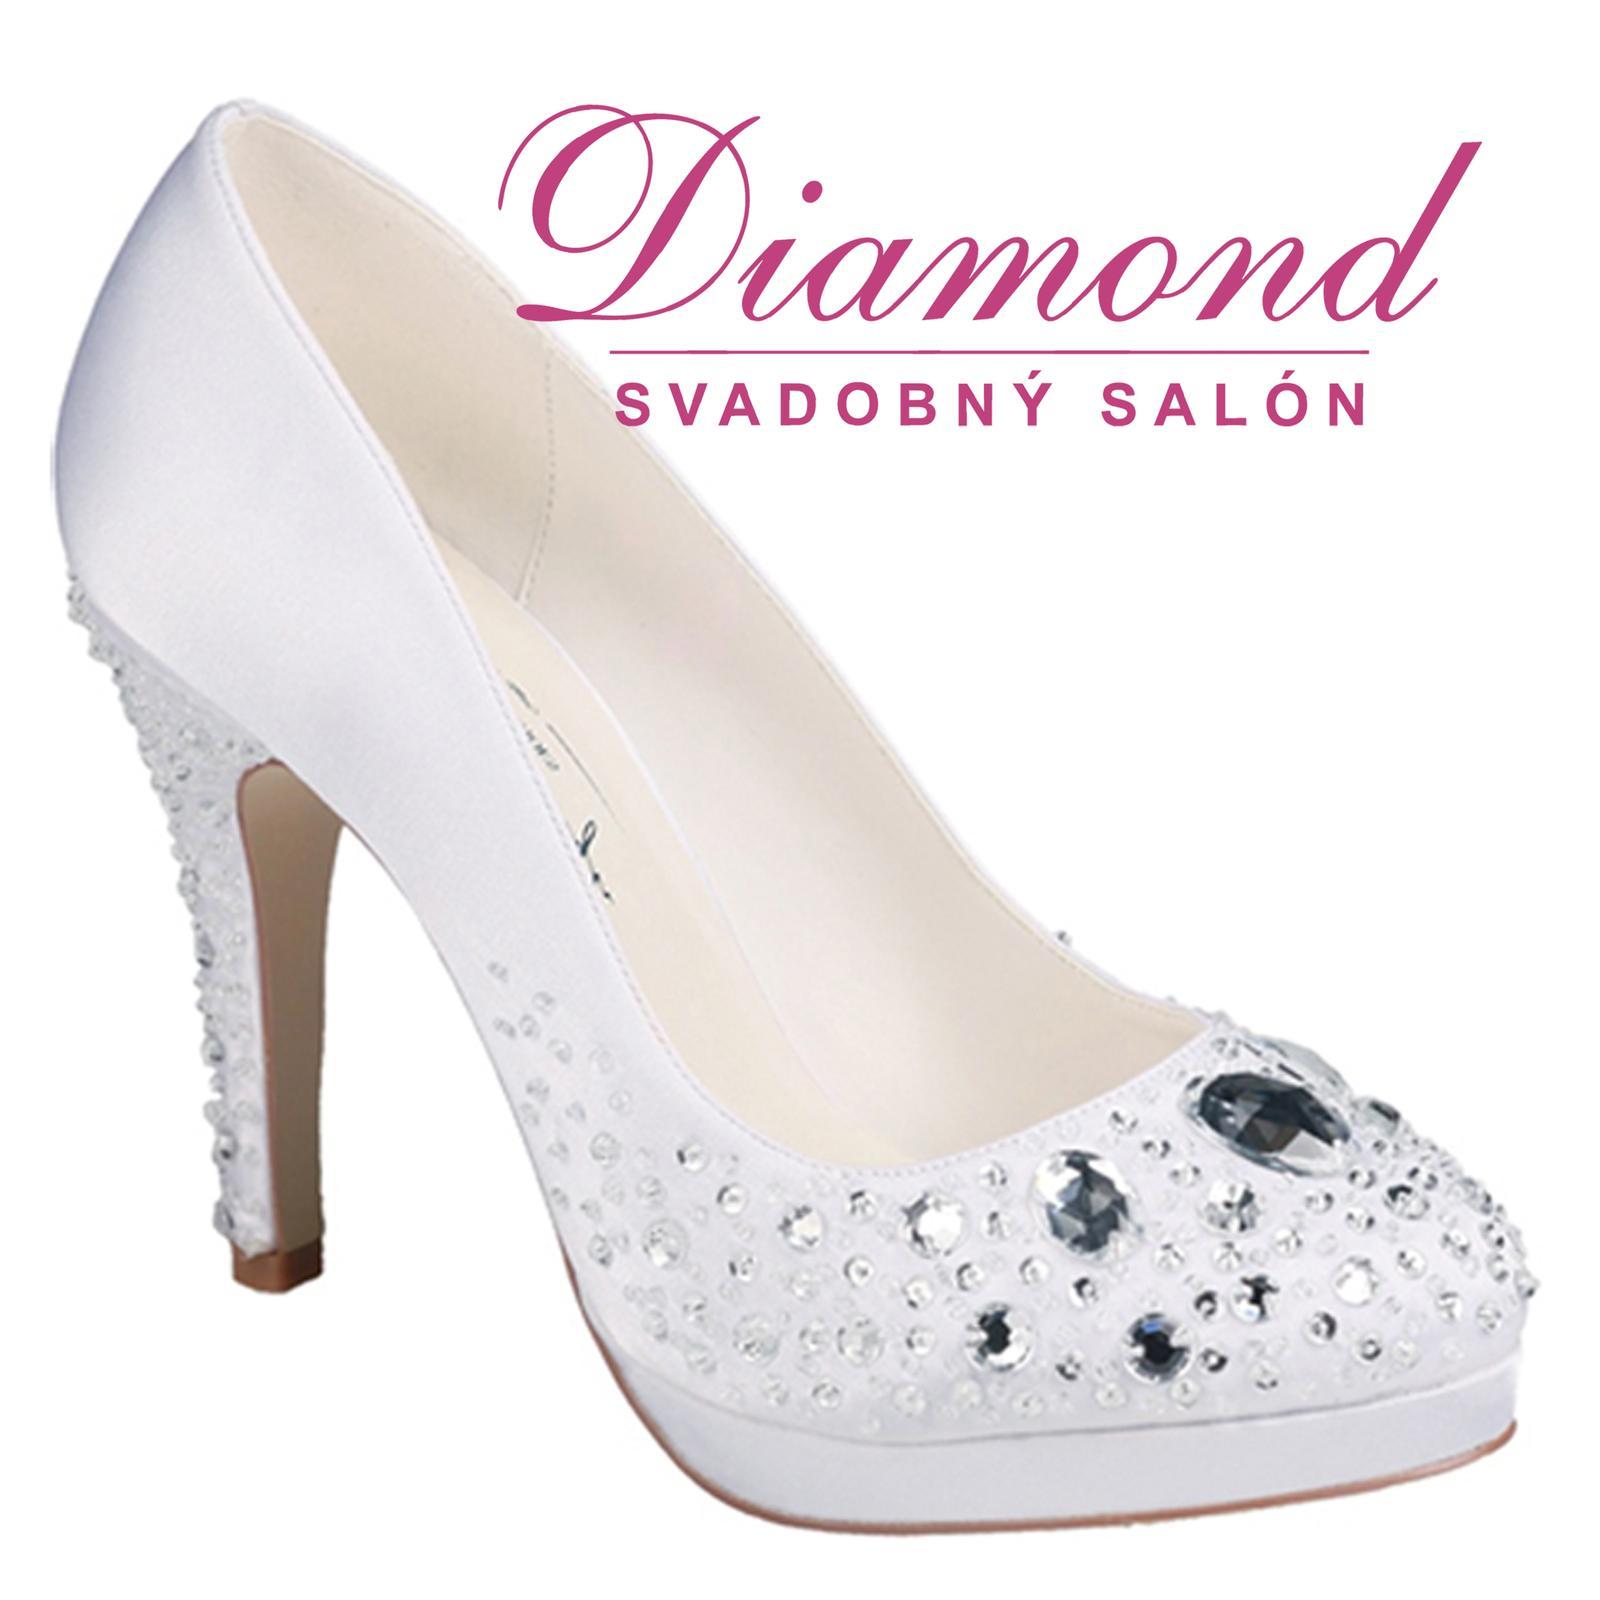 Svadobné topánky Vivienne - Obrázok č. 1